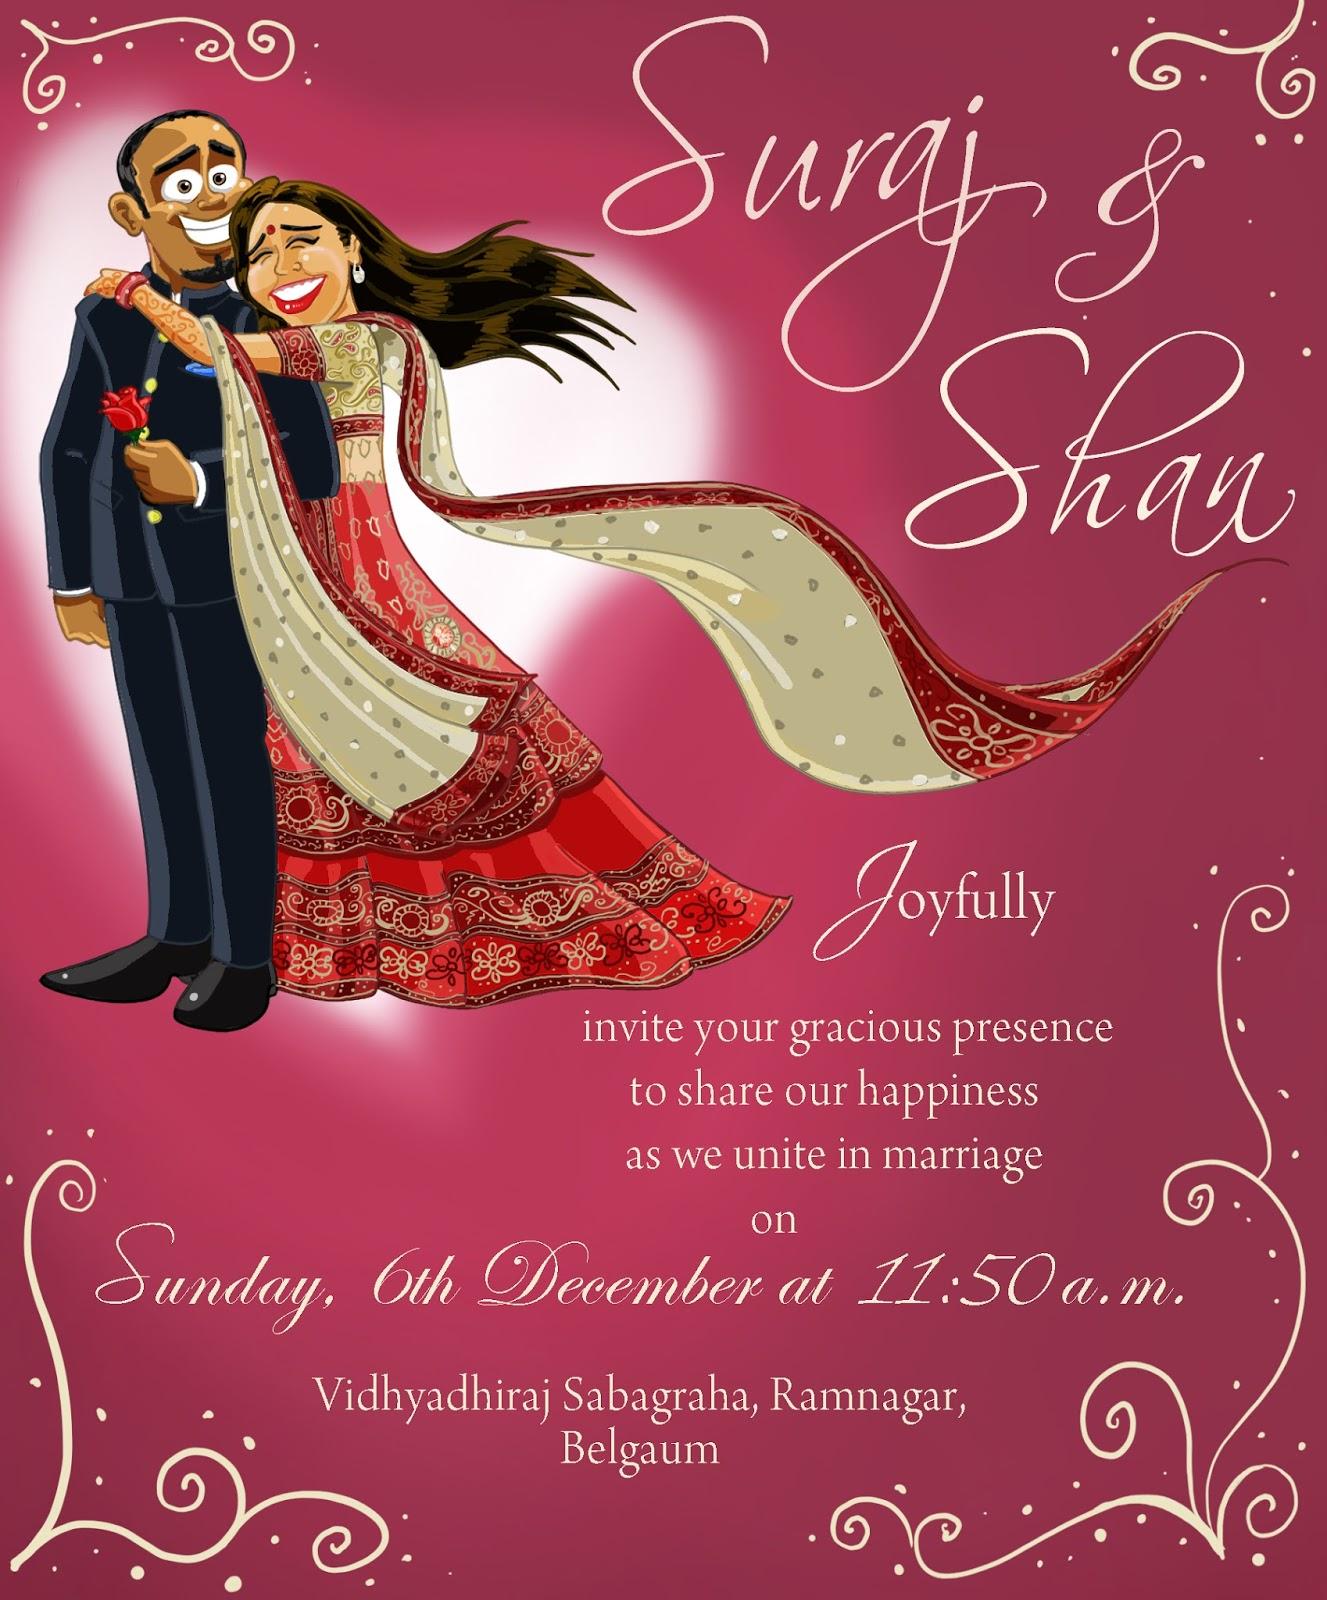 Dapoon\'s blog: Wedding card: Suraj and Shan